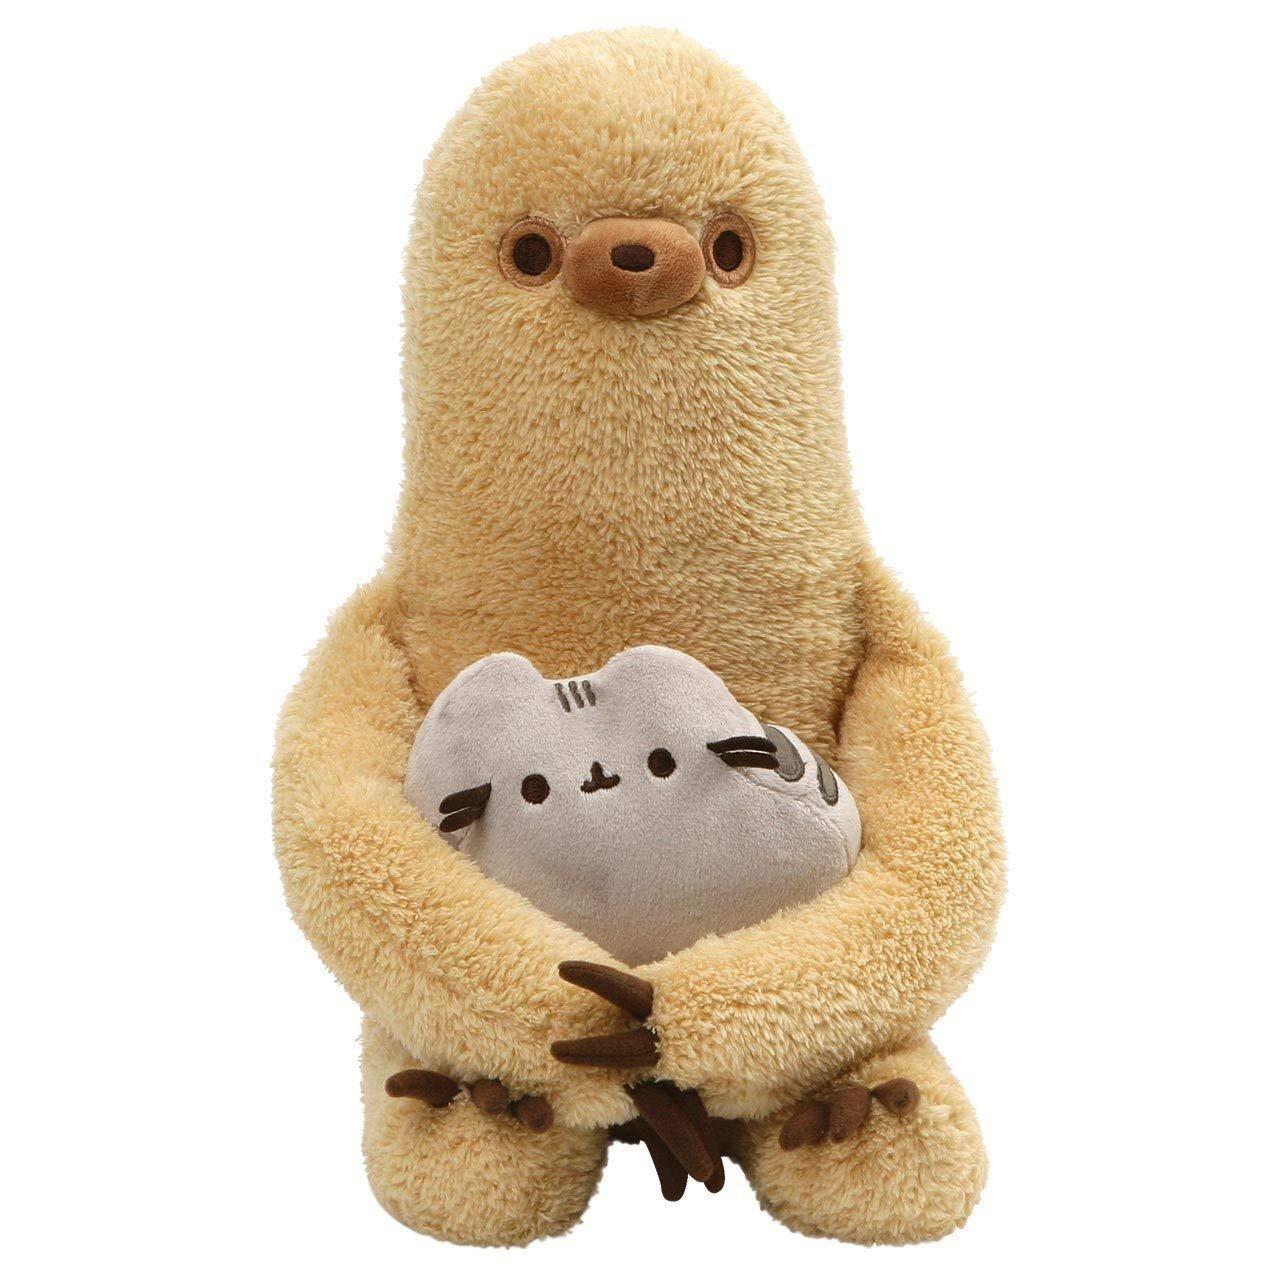 GUND Pusheen with Sloth Plush Stuffed Animal, Set of 2, Multicolor, 13